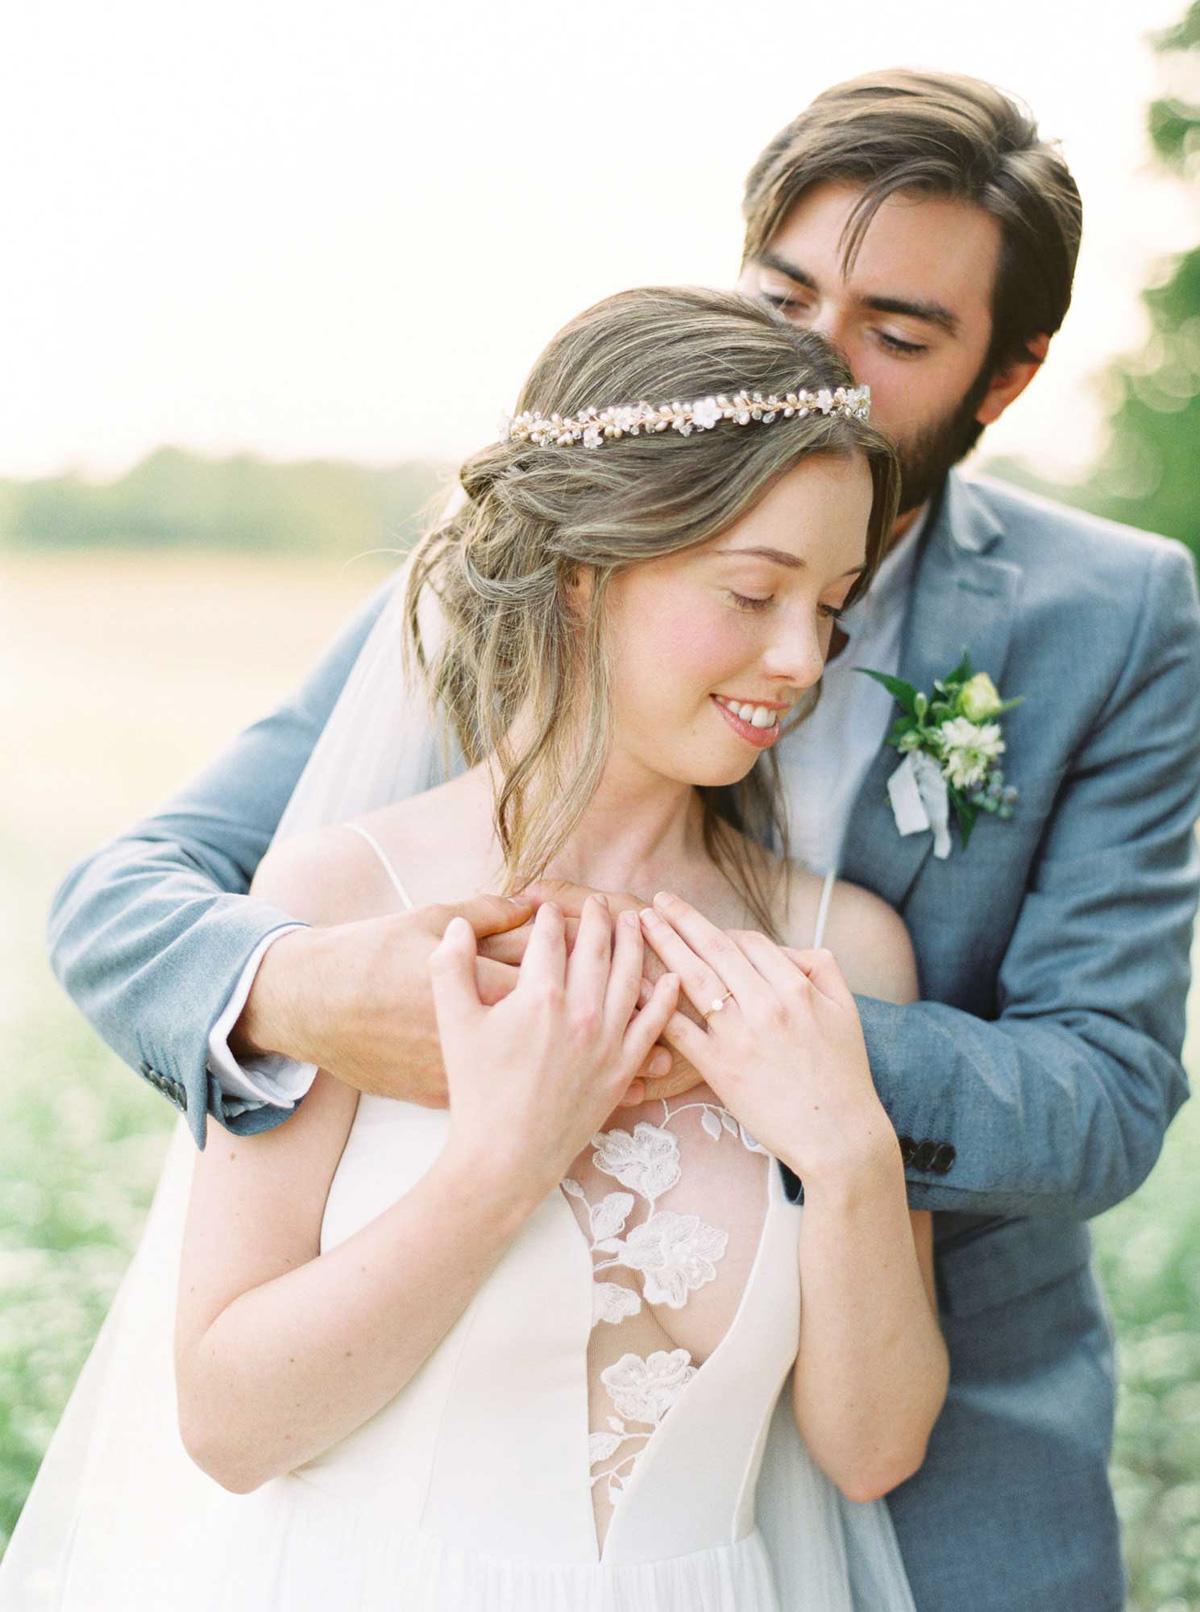 kayla-yestal-vineyard-bride-swish-list-woodland-weddings-niagara-wedding-editorial-25.jpg